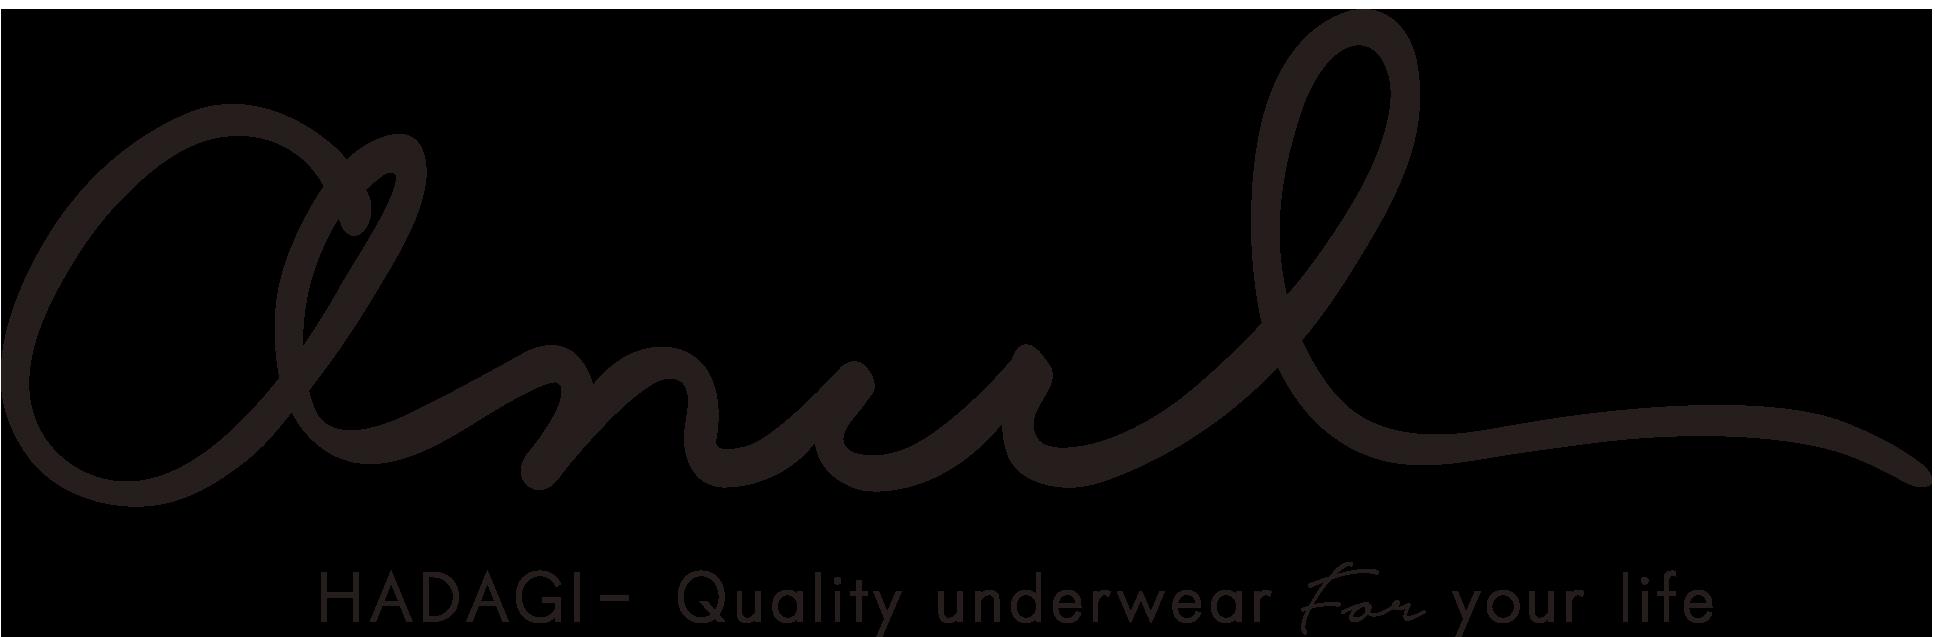 anul HADAGI - Quality underwear For your life